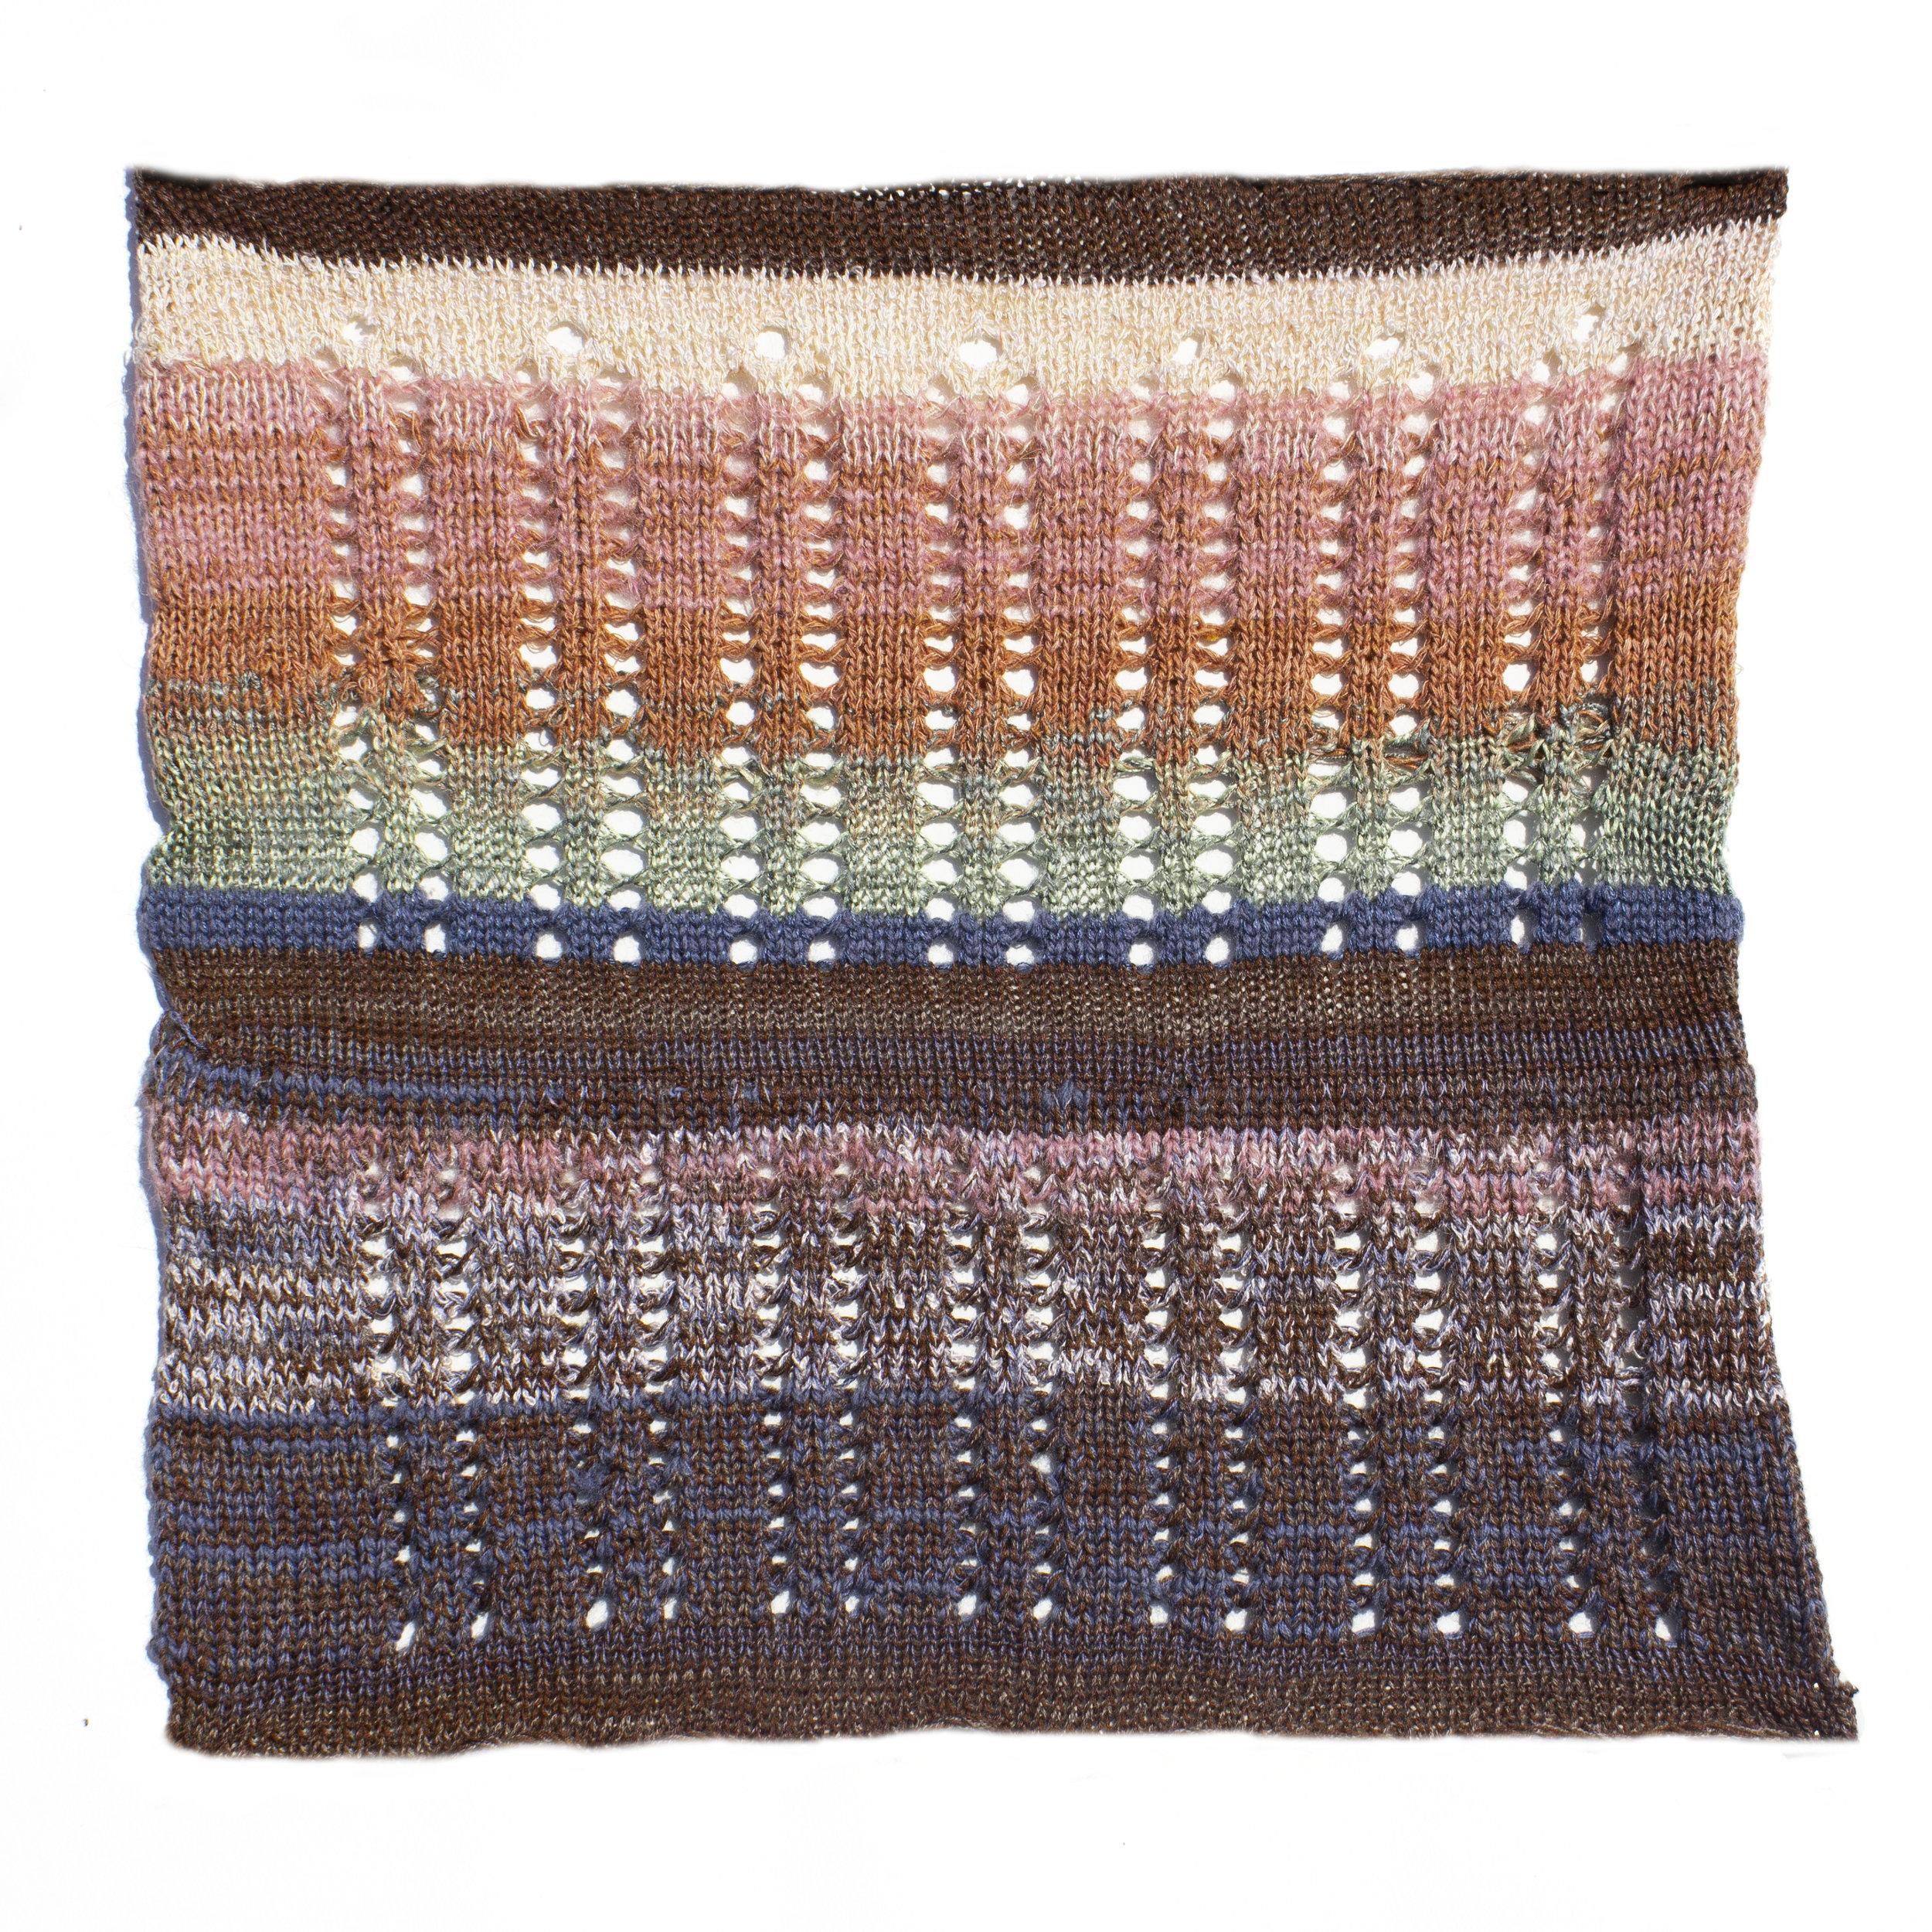 knit1.0.jpg